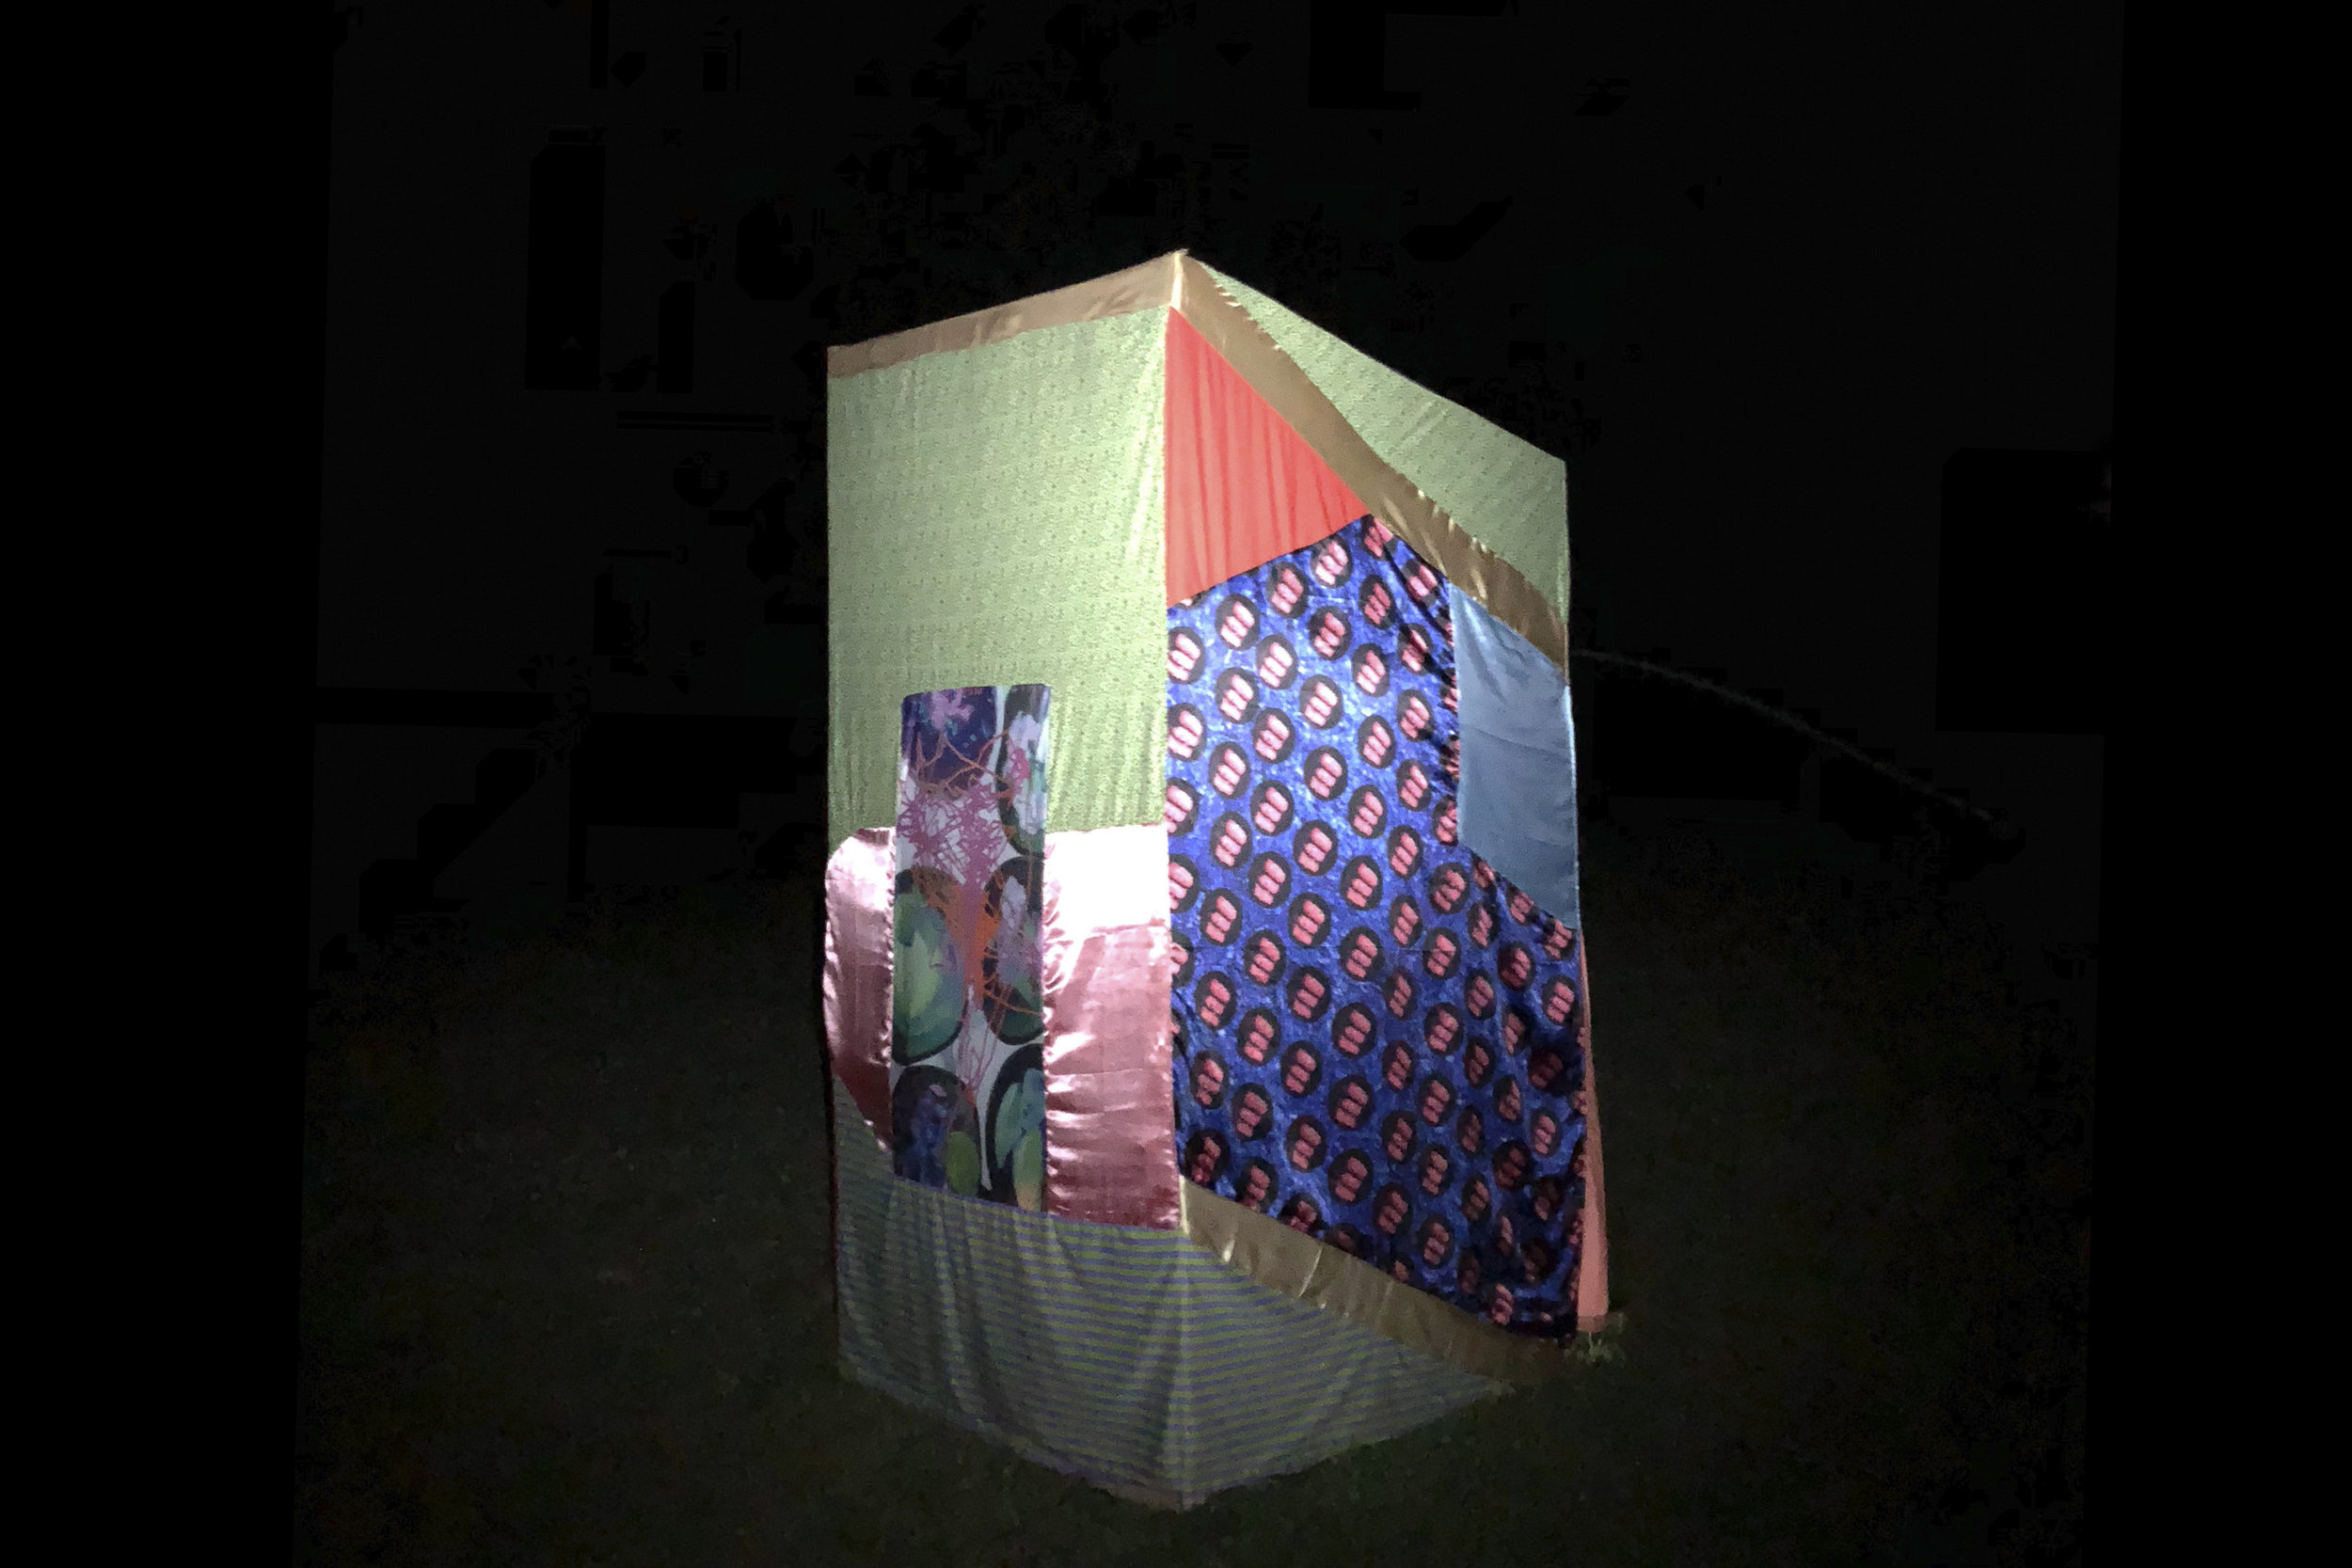 4. Fissure in the Air, 2018, Installation view at night, Upper Field, Skowhegan, Maine.jpg